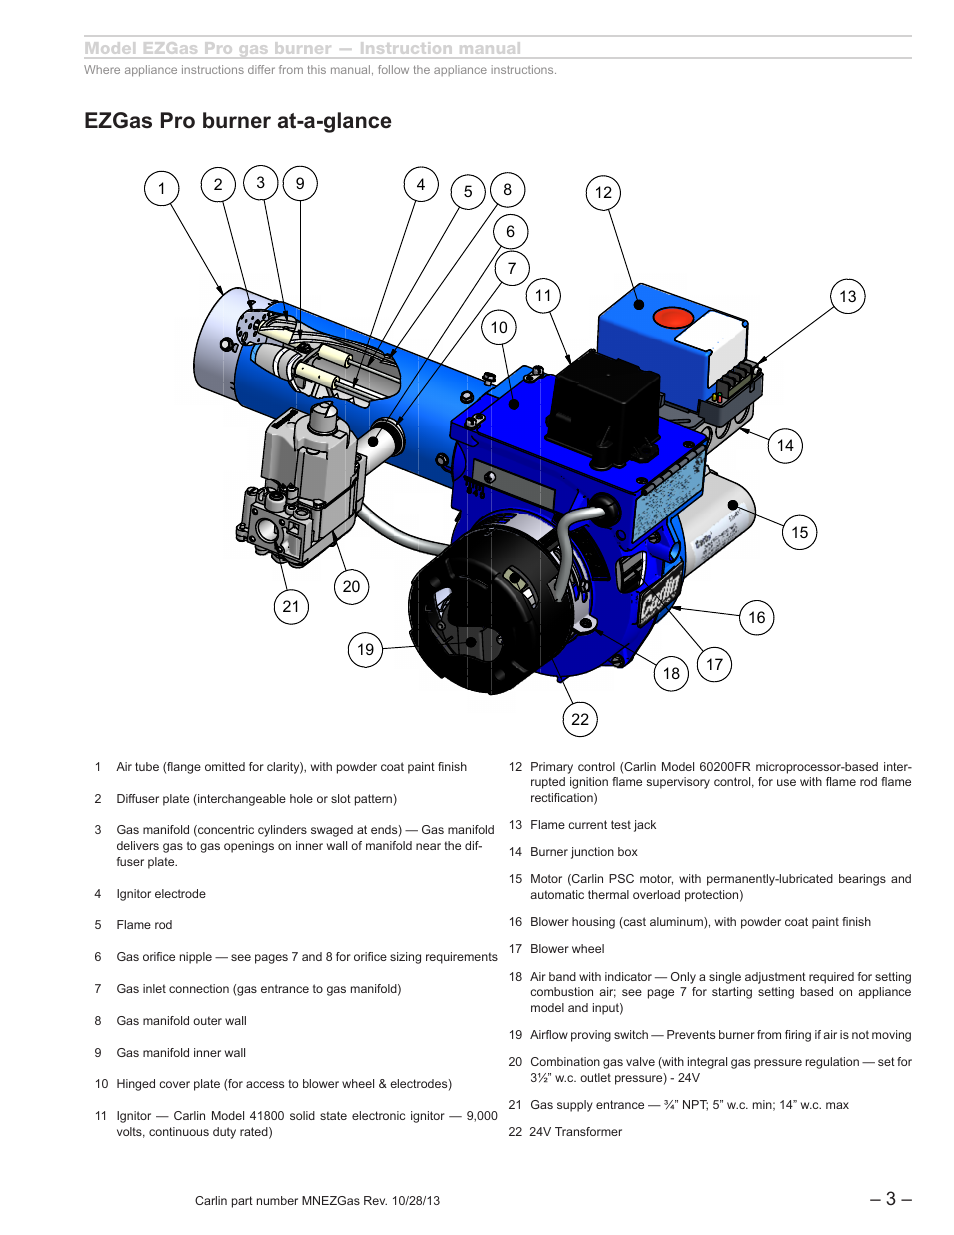 Ez gas_reva_flippedelectrode_1, Bsize, Ezgas pro burner at-a-glance | Carlin  EZGasPro User Manual | Page 3 / 24